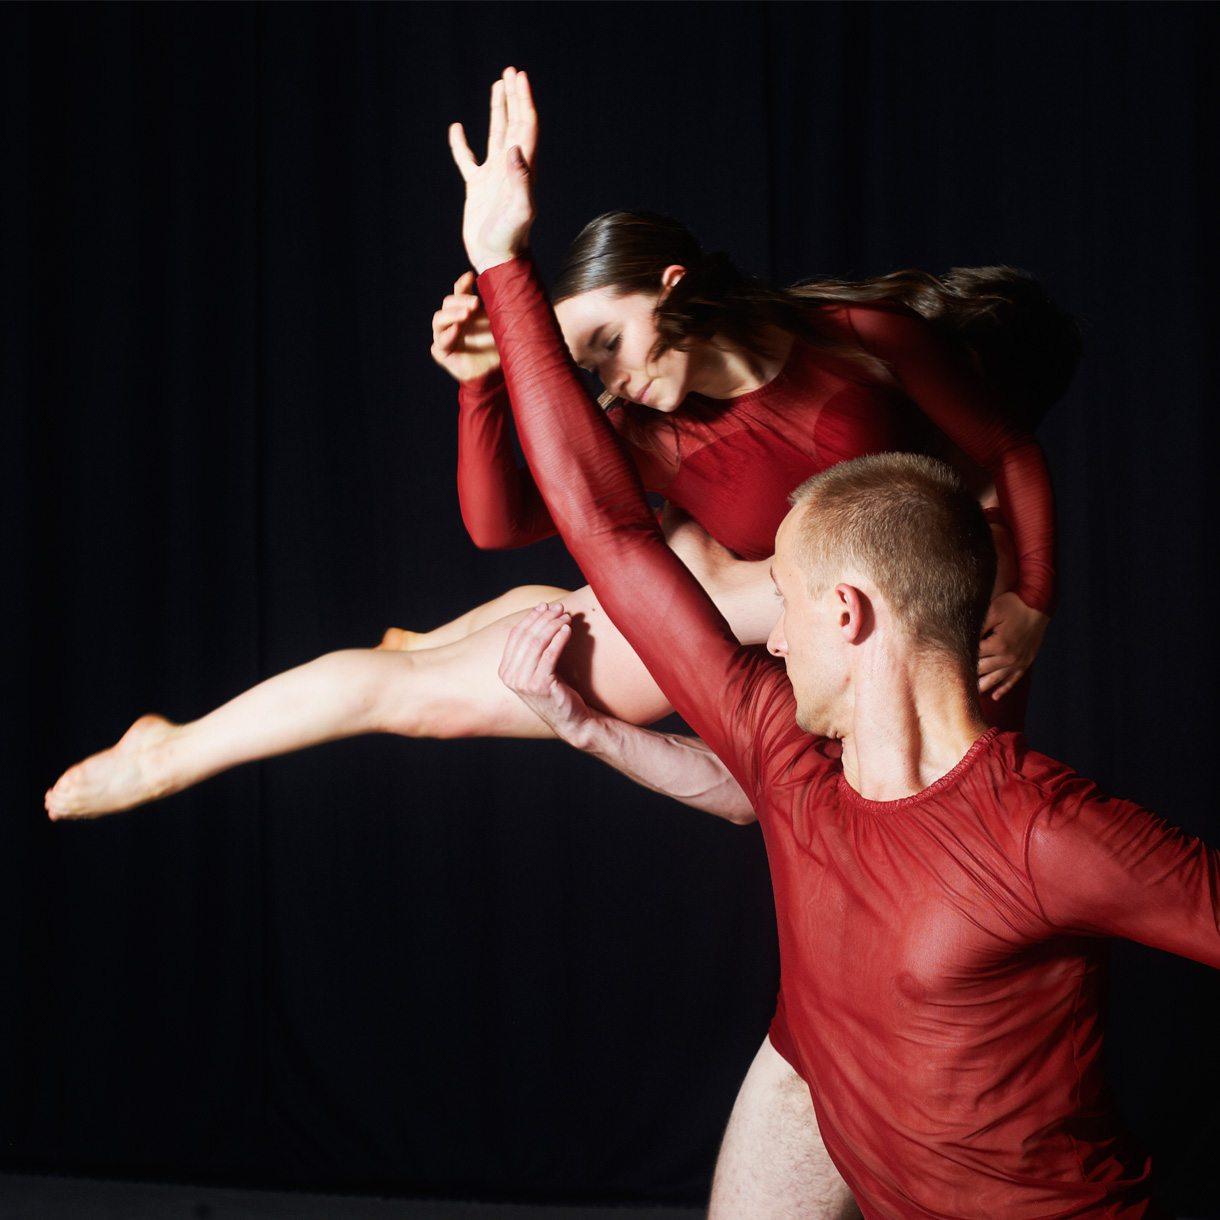 Kerry Nicholls choreography